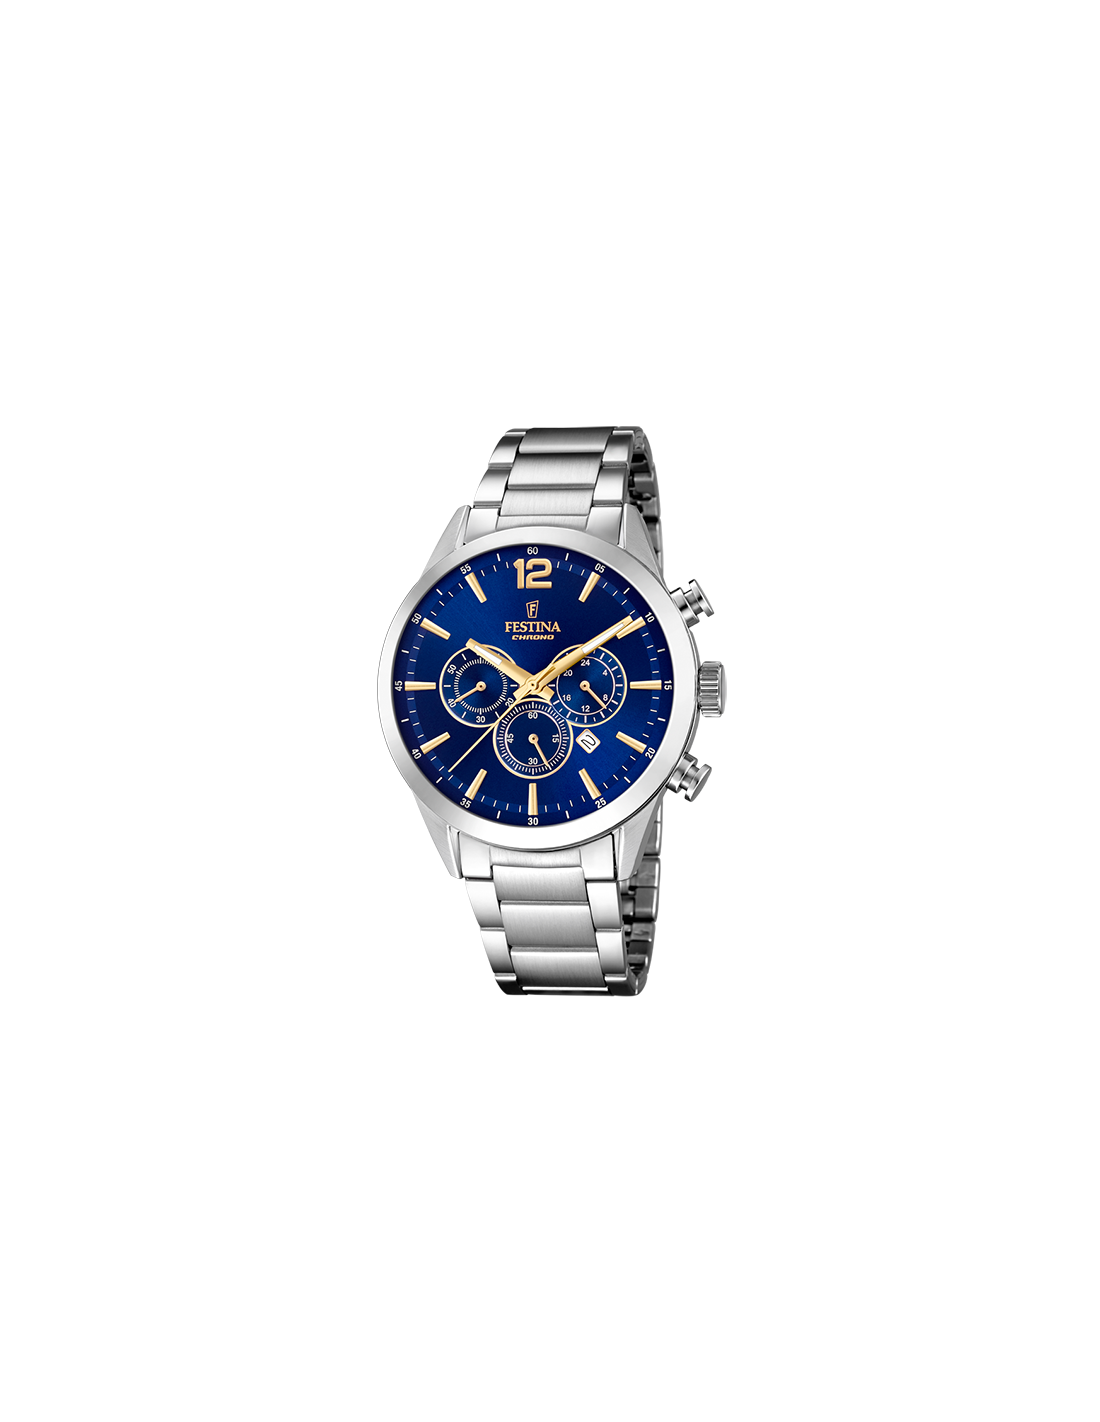 829814713204 Reloj Festina hombre F20343 2 cronógrafo